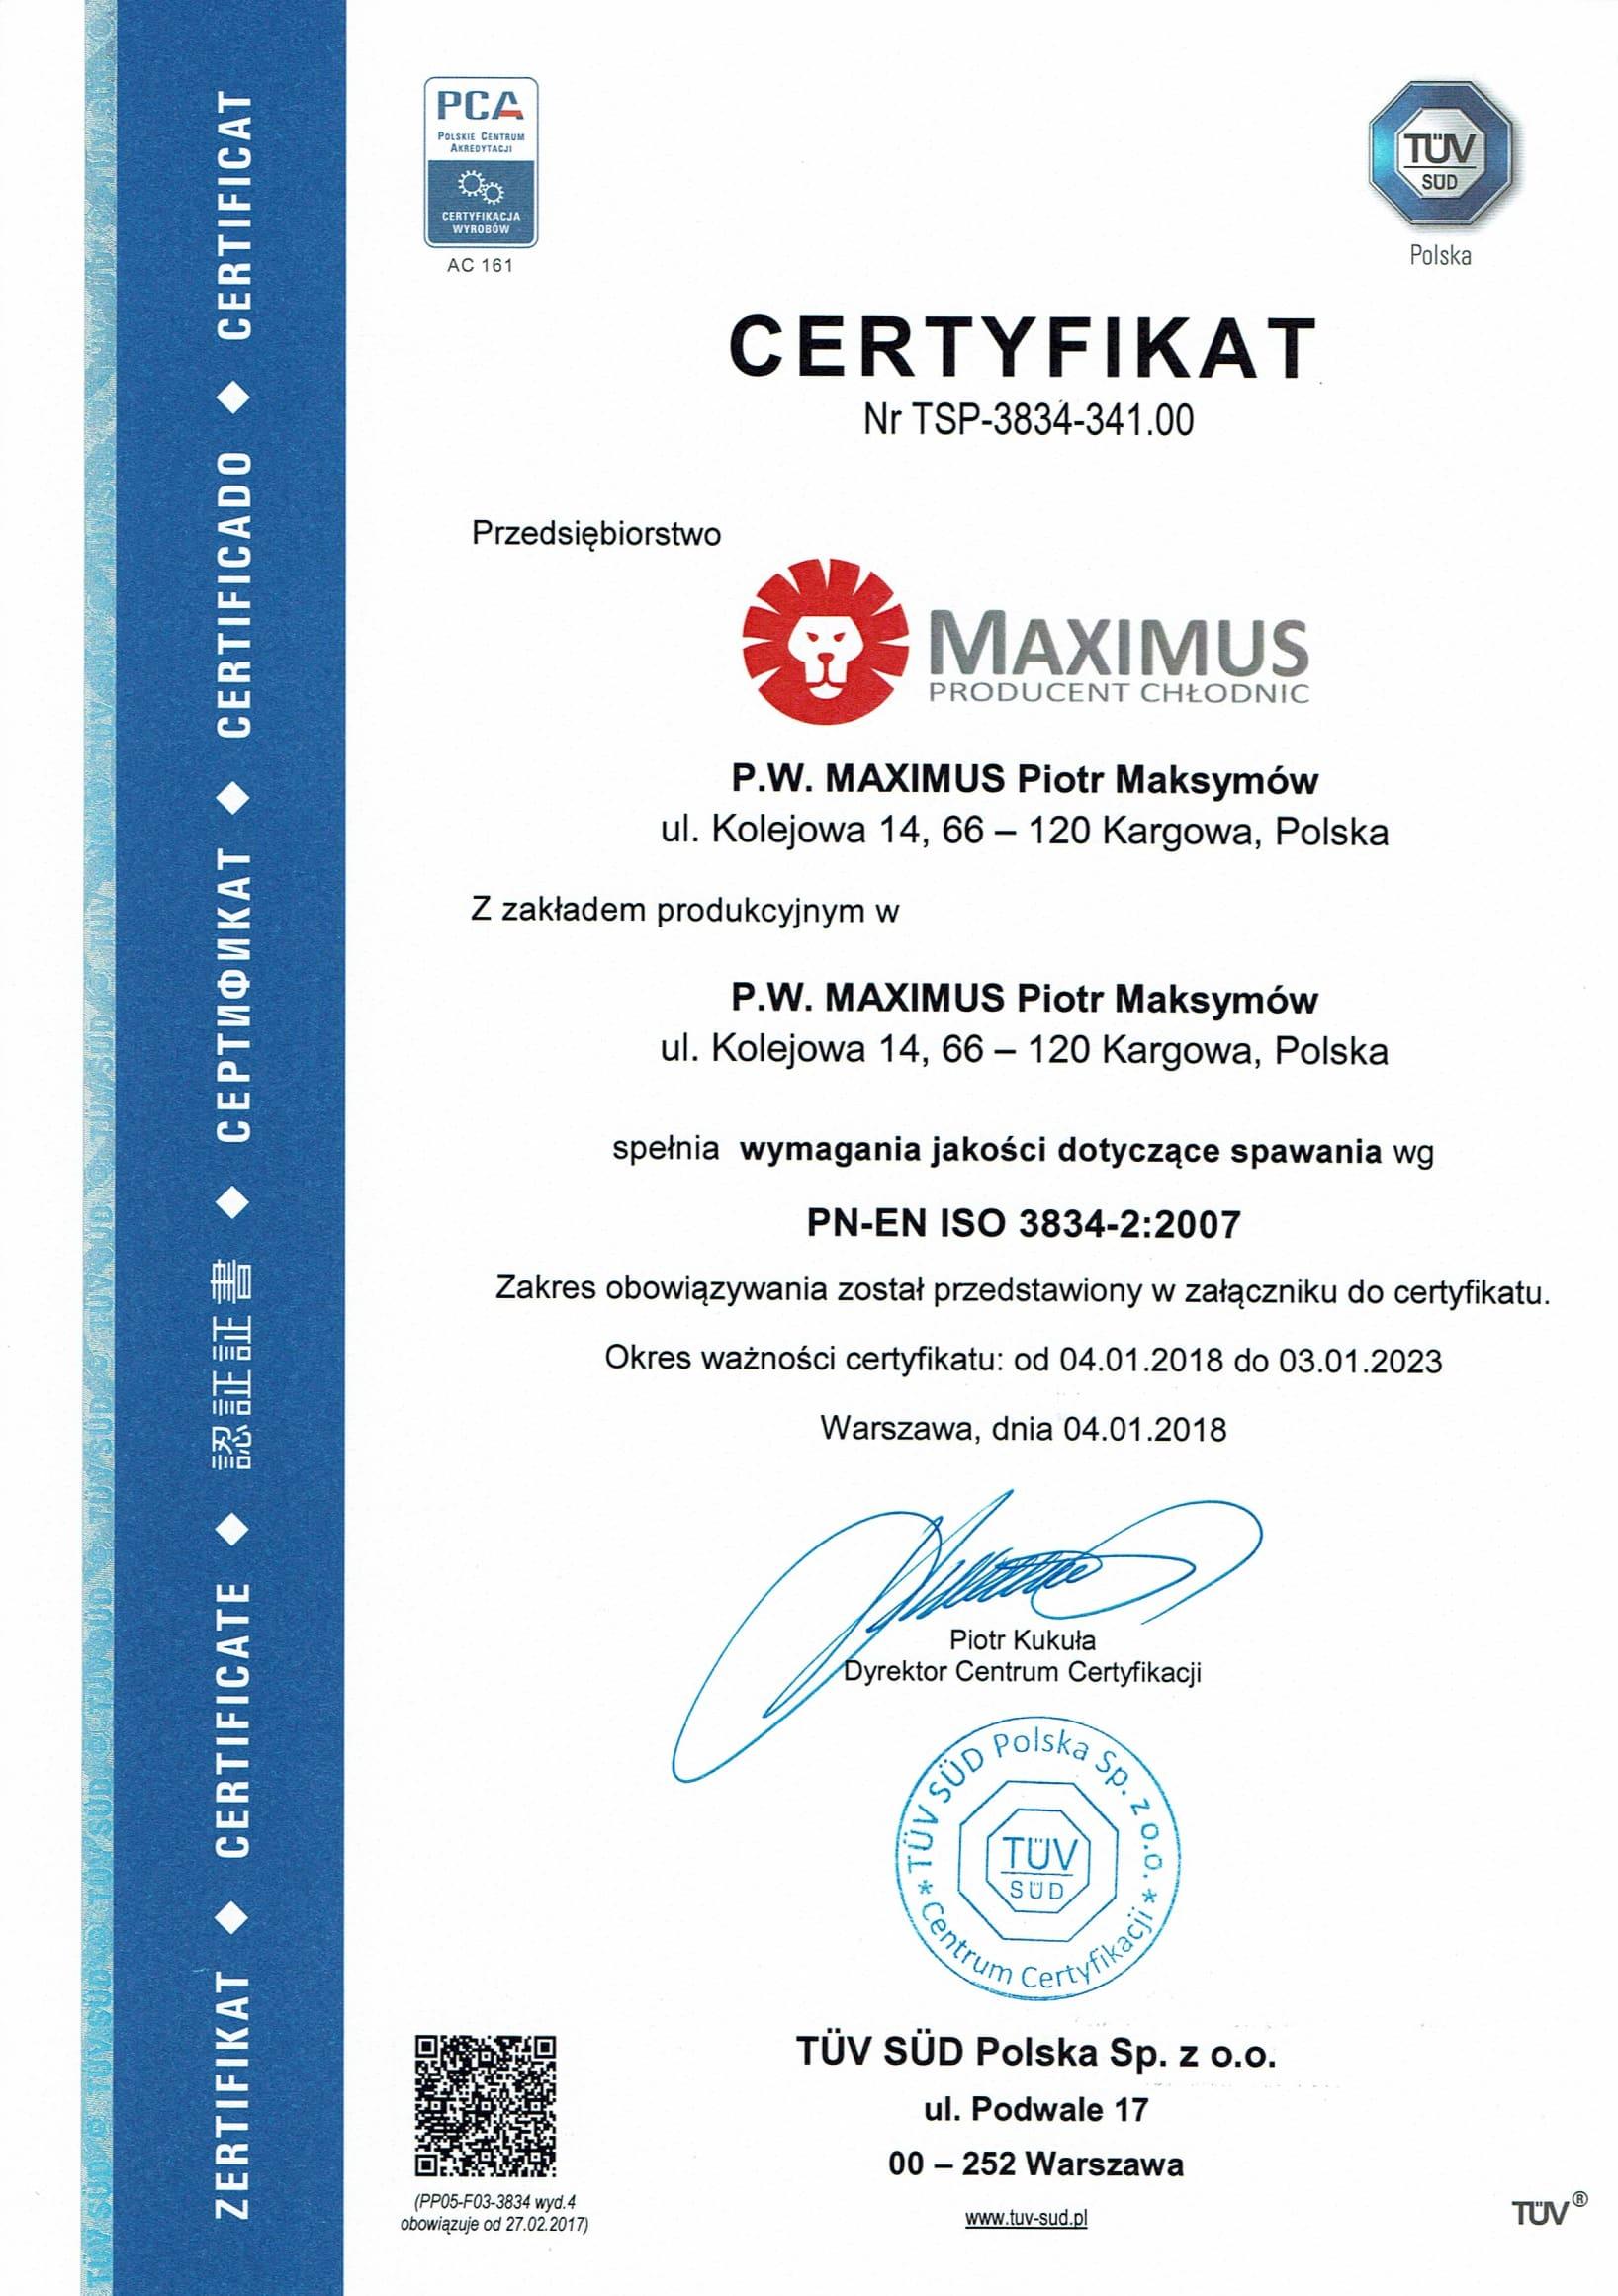 certyfikat polski 3834 1 4